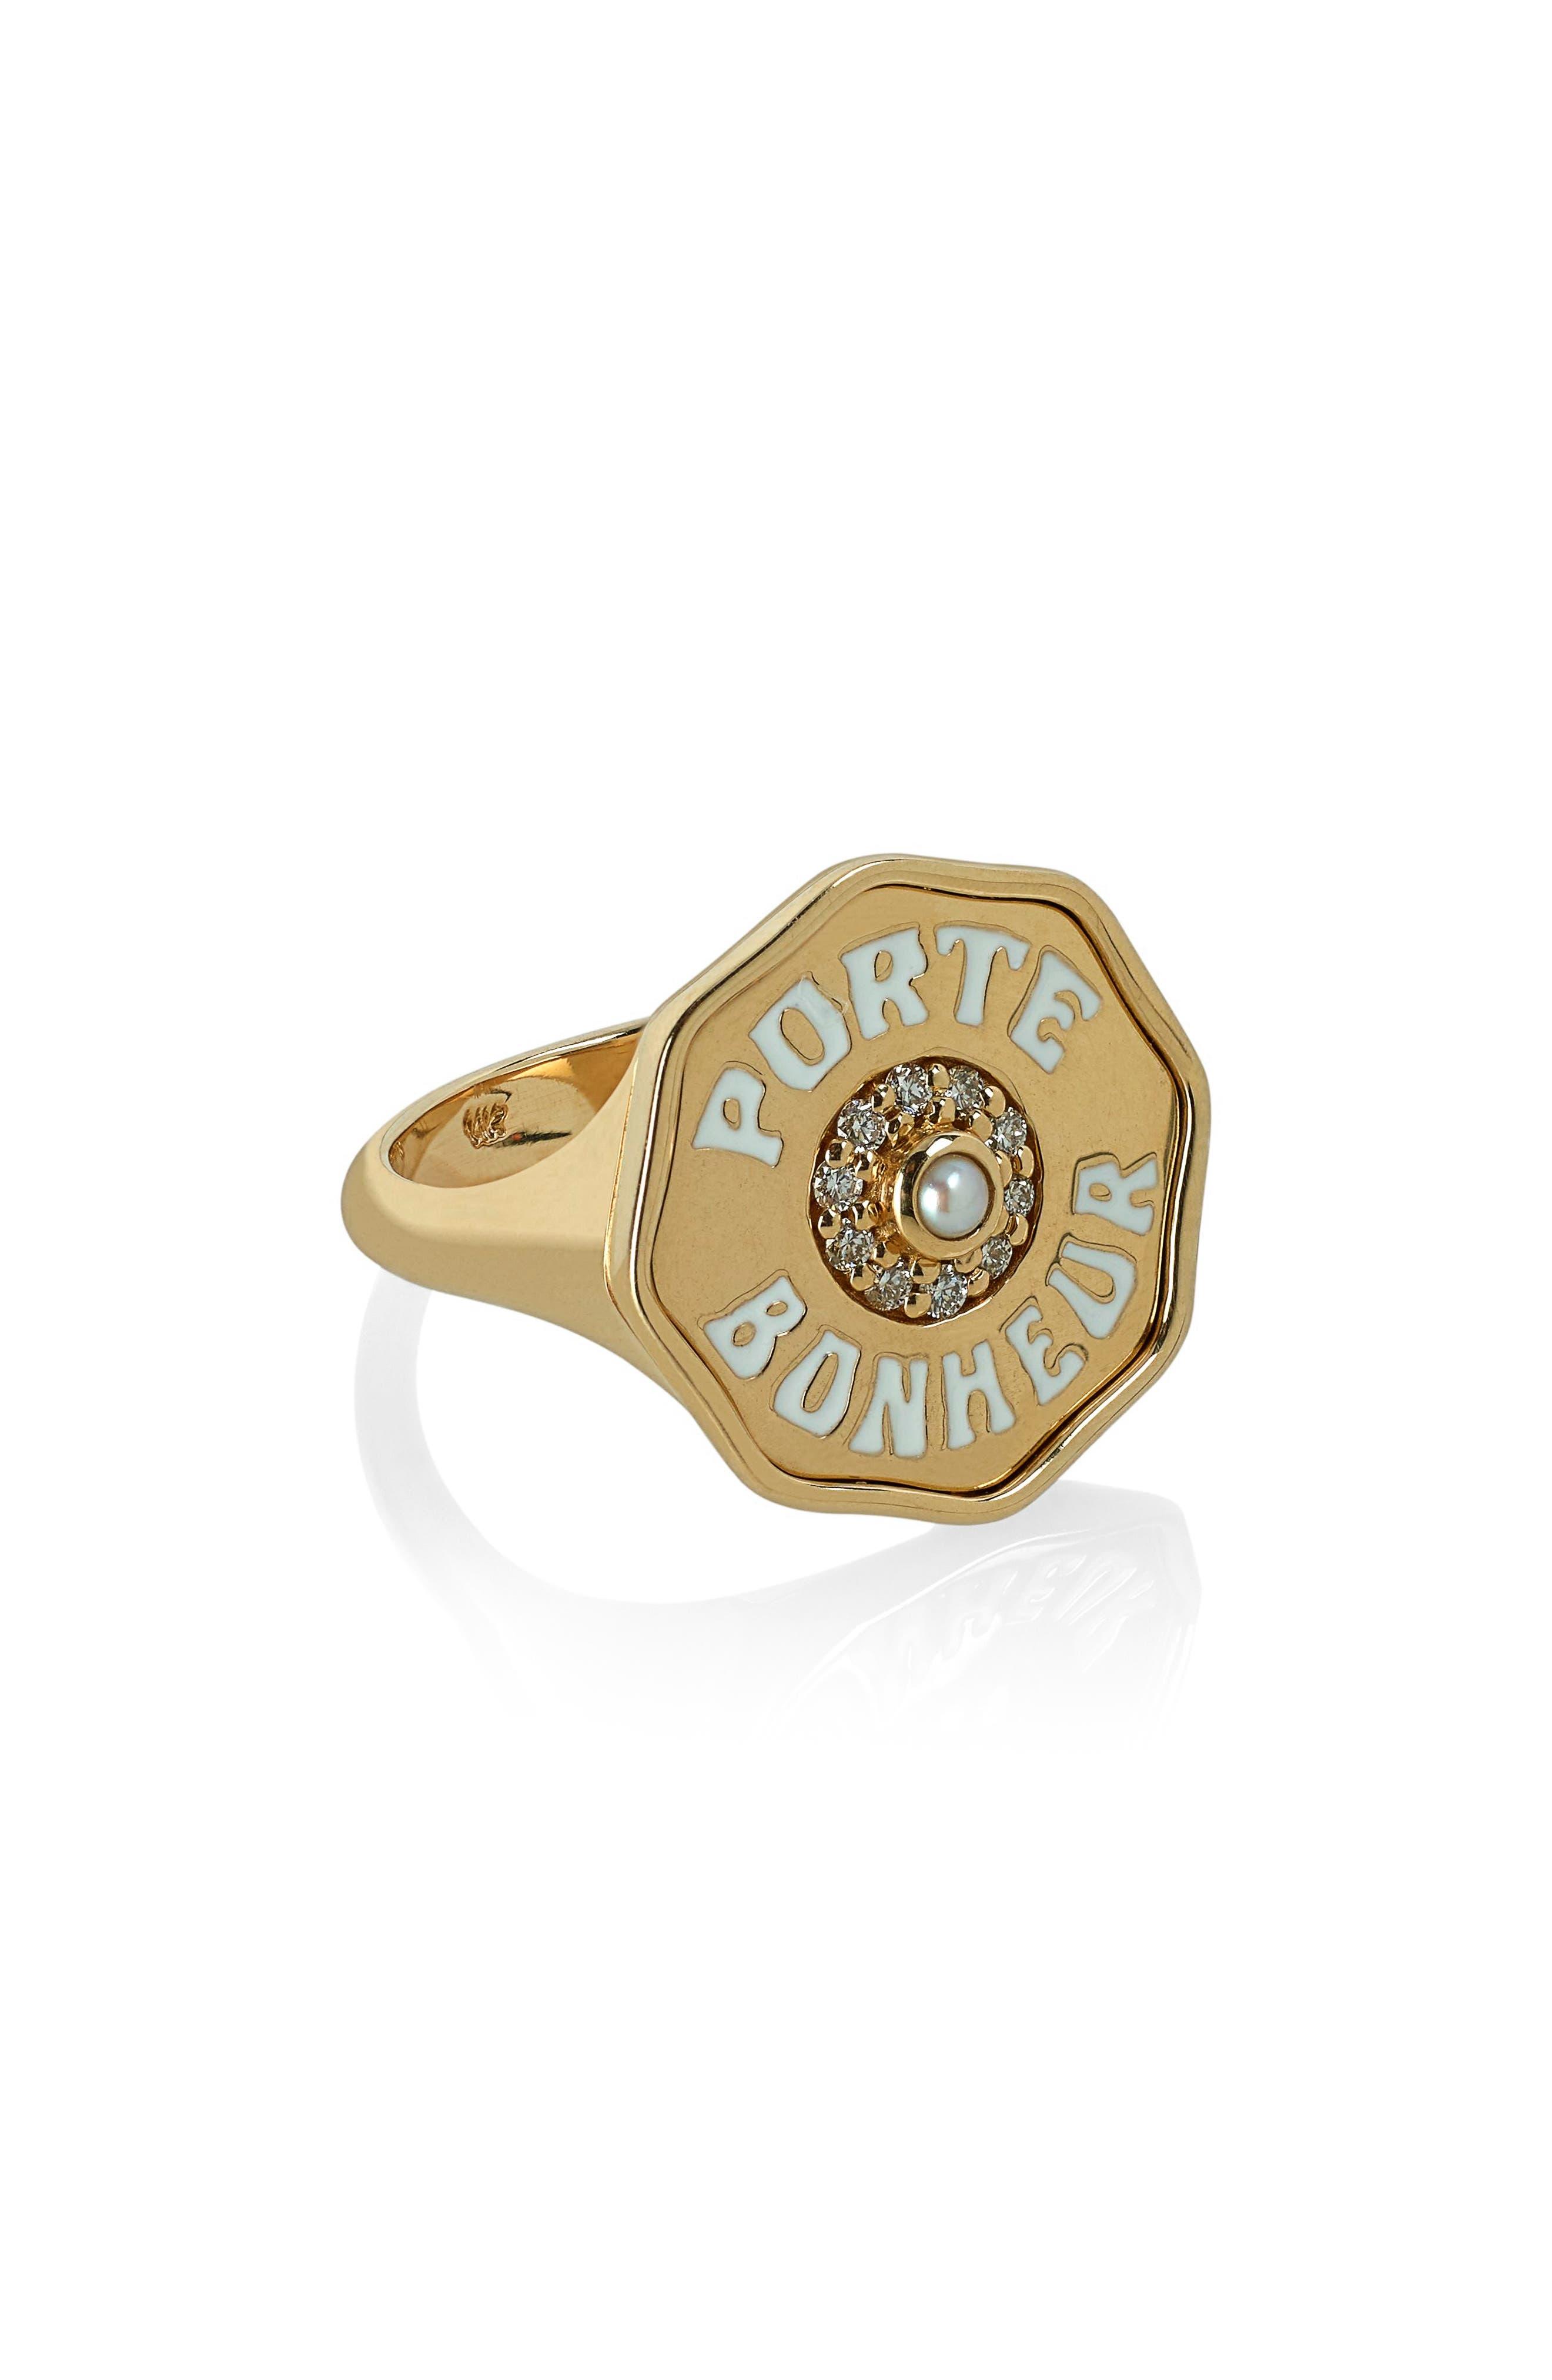 Porte Bonhuer Coin Ring,                             Main thumbnail 1, color,                             YELLOW GOLD